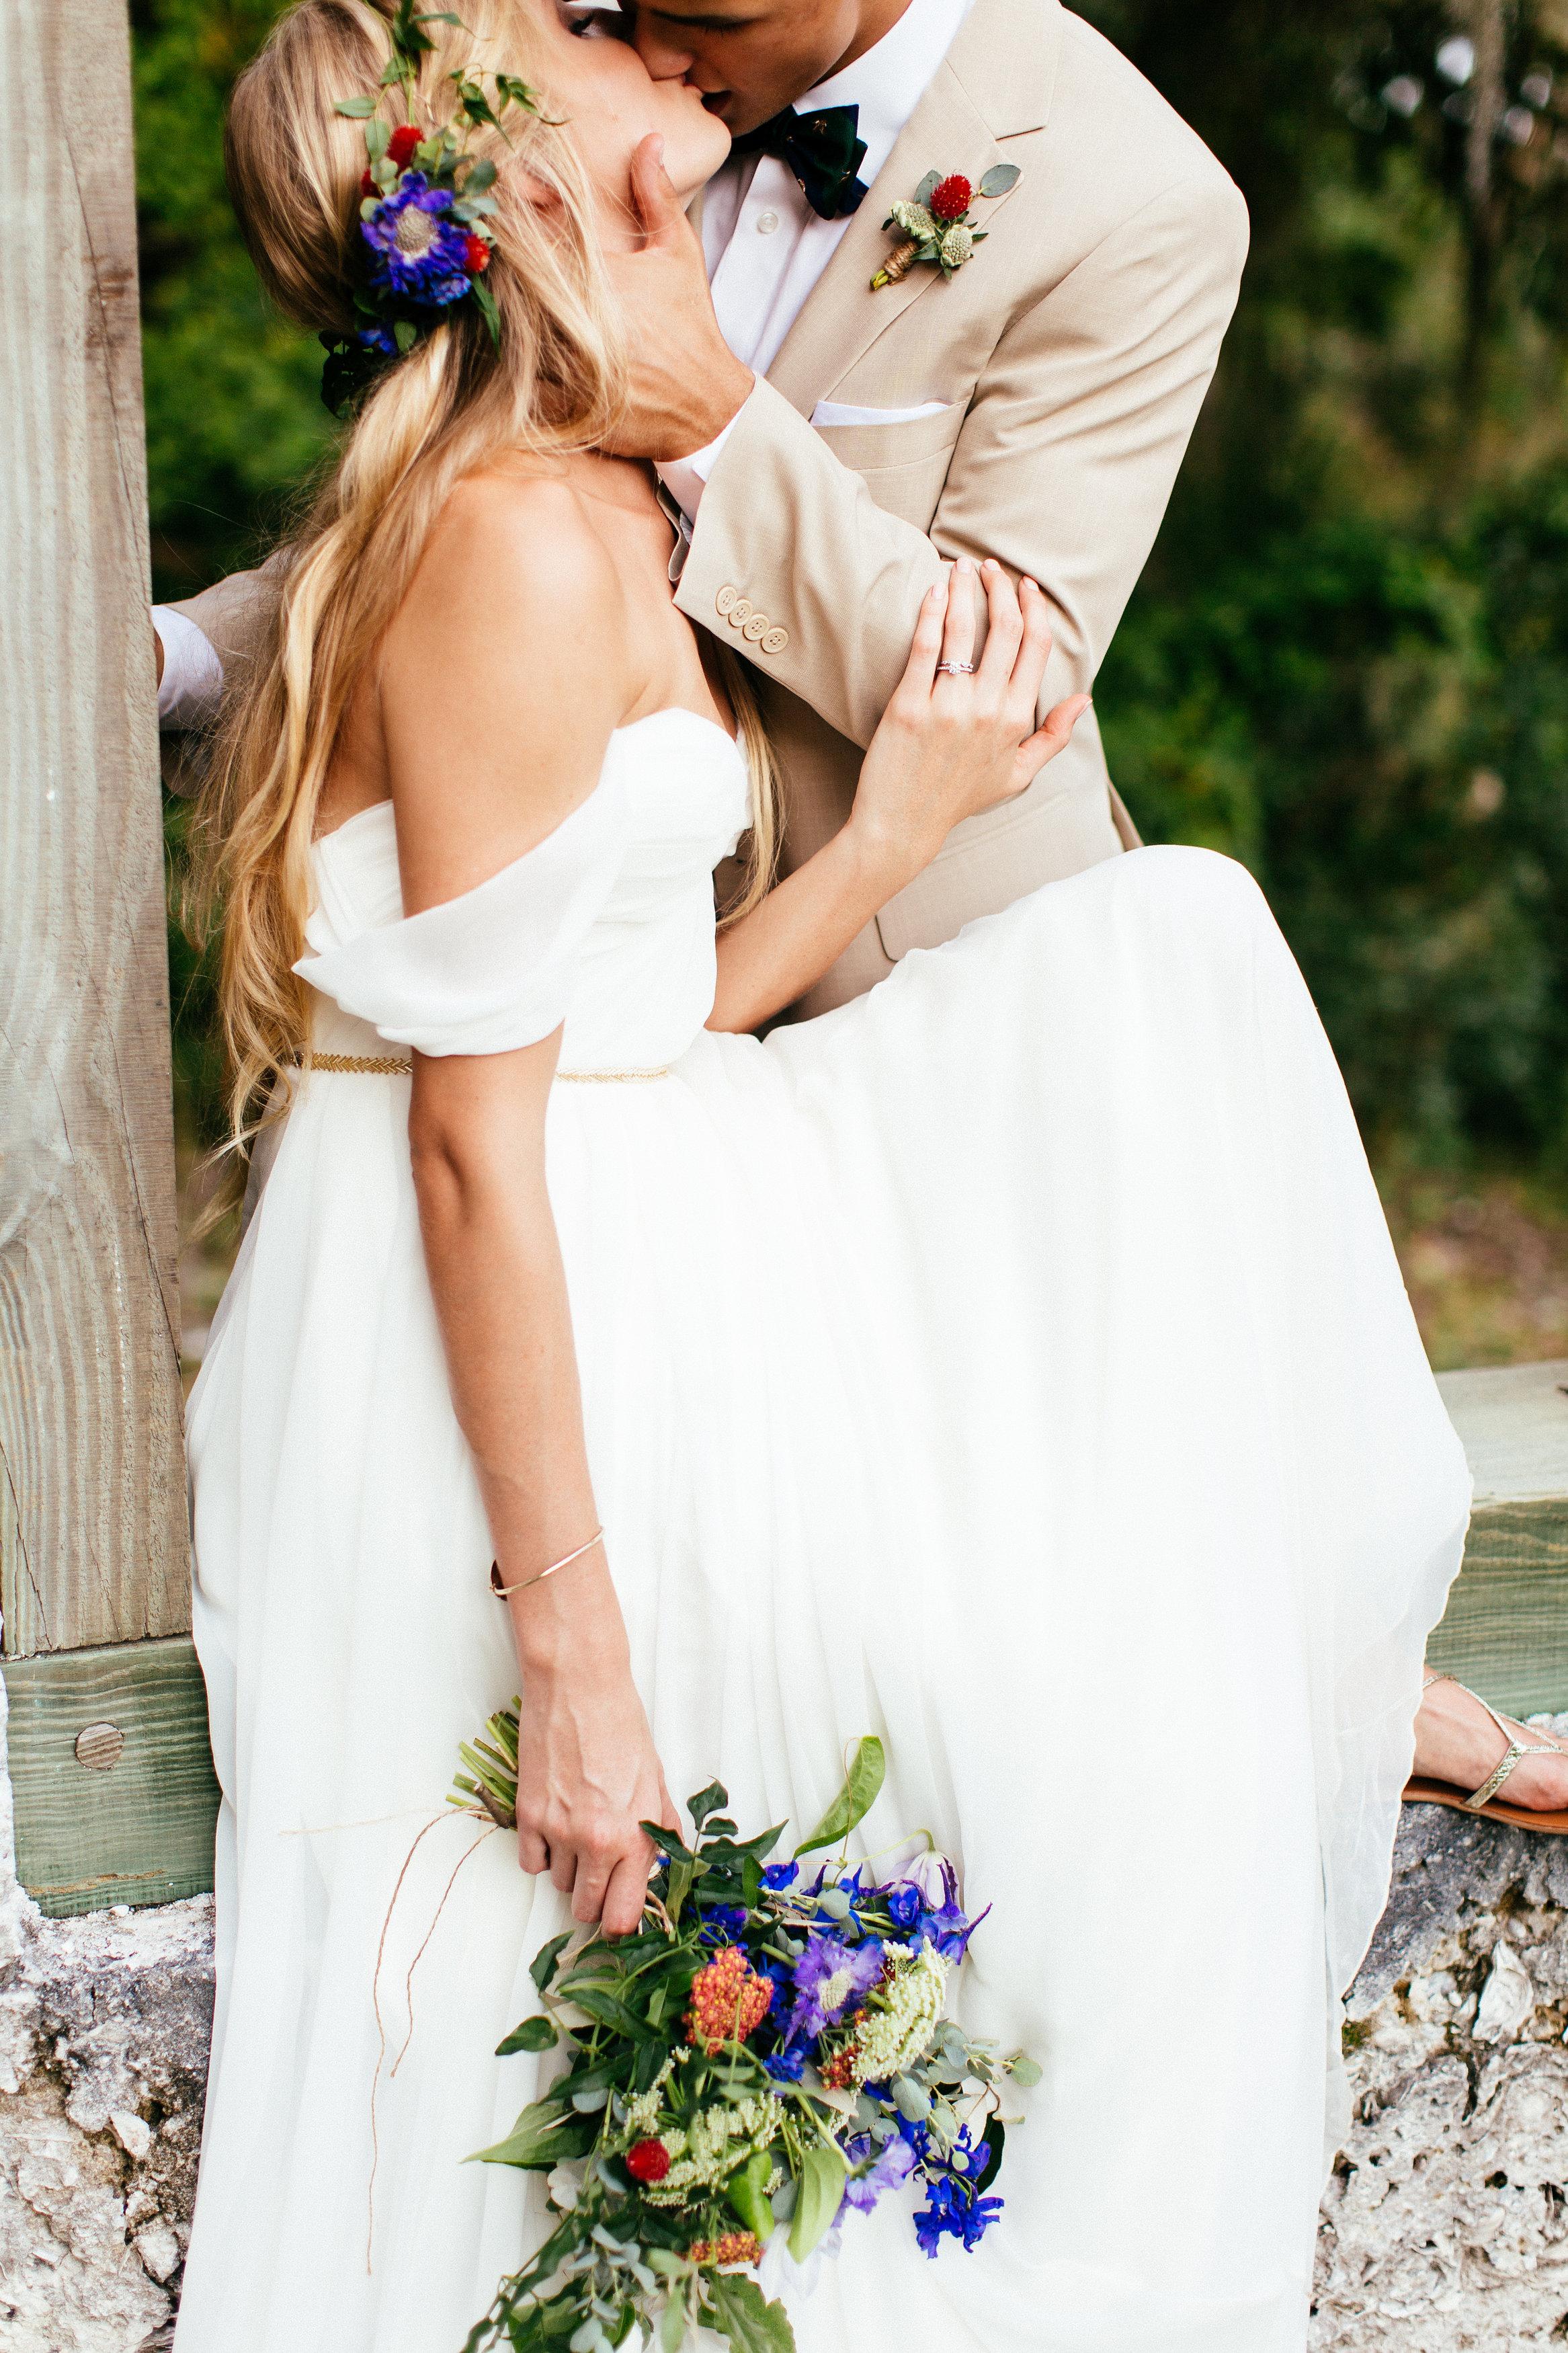 christina-karst-photography-ivory-and-beau-bridal-boutique-sarah-seven-lafayette-boho-bride-boho-bridal-boutique-indie-bridal-boutique-savannah-bridal-boutique-savannah-wedding-dresses-savannah-bridal-gowns-24.jpg